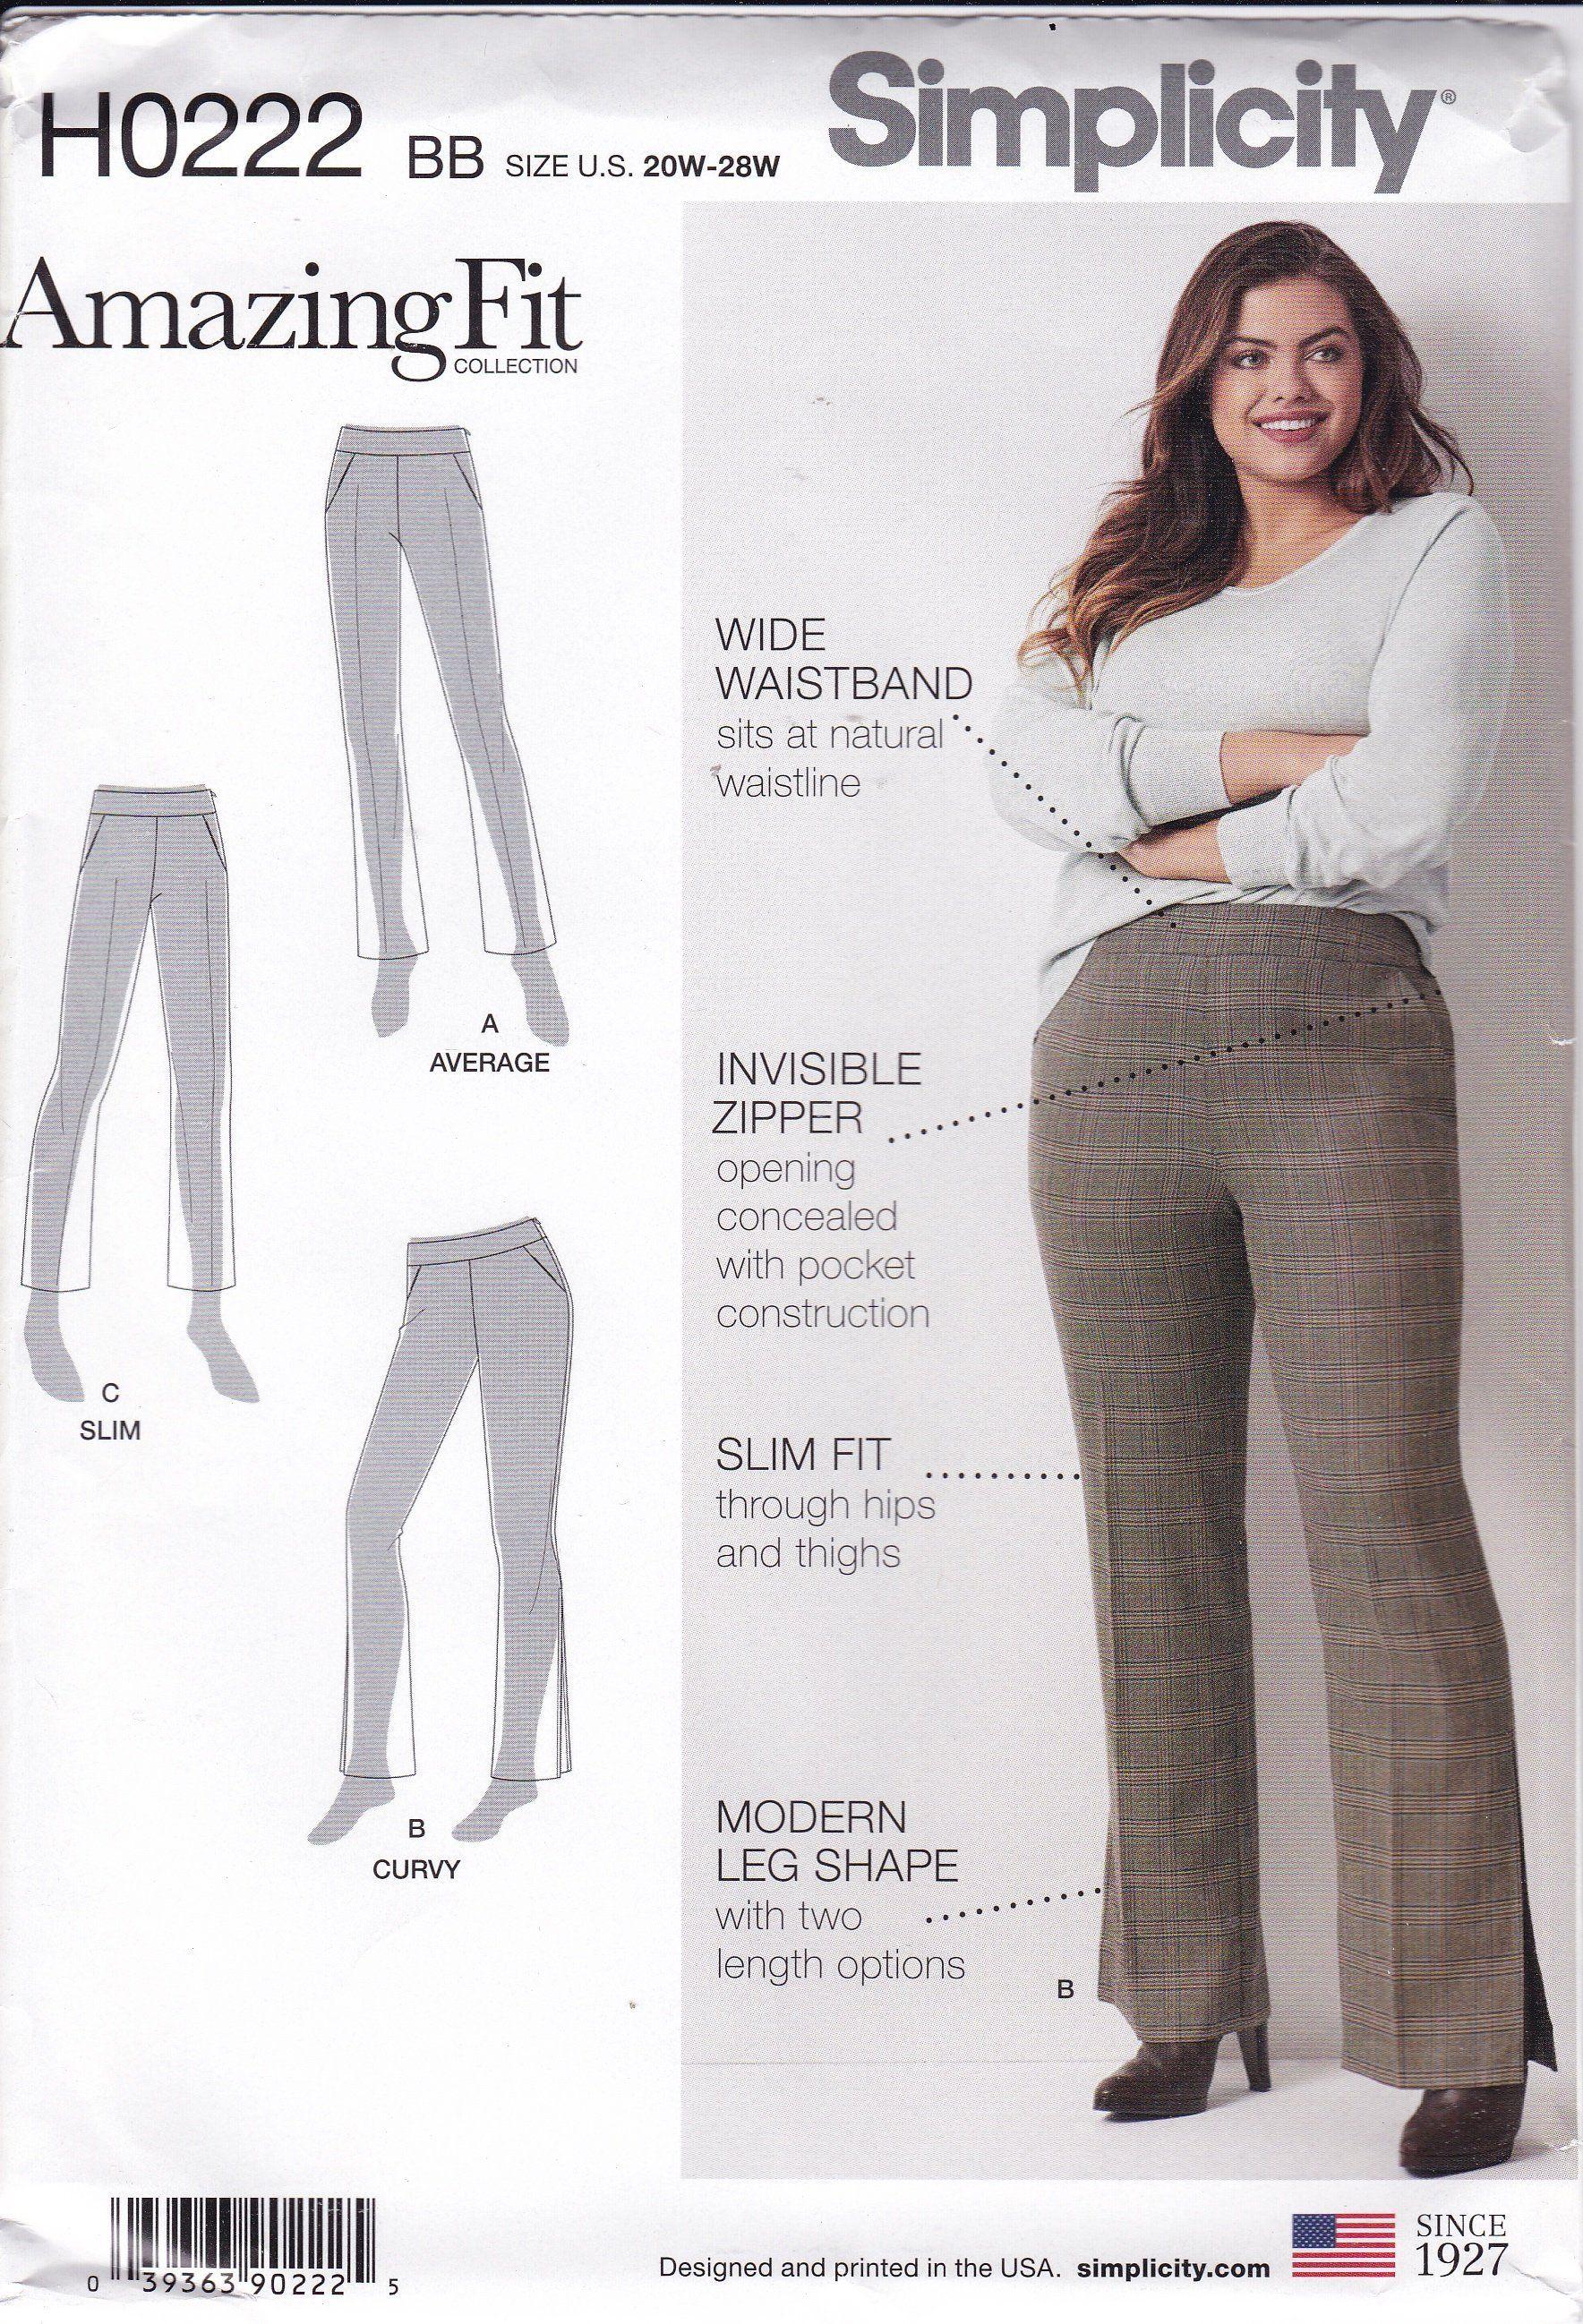 959cc4127b FREE US SHIP Simplicity 0222 8744 Sewing Pattern Amazing Fit Pants ...